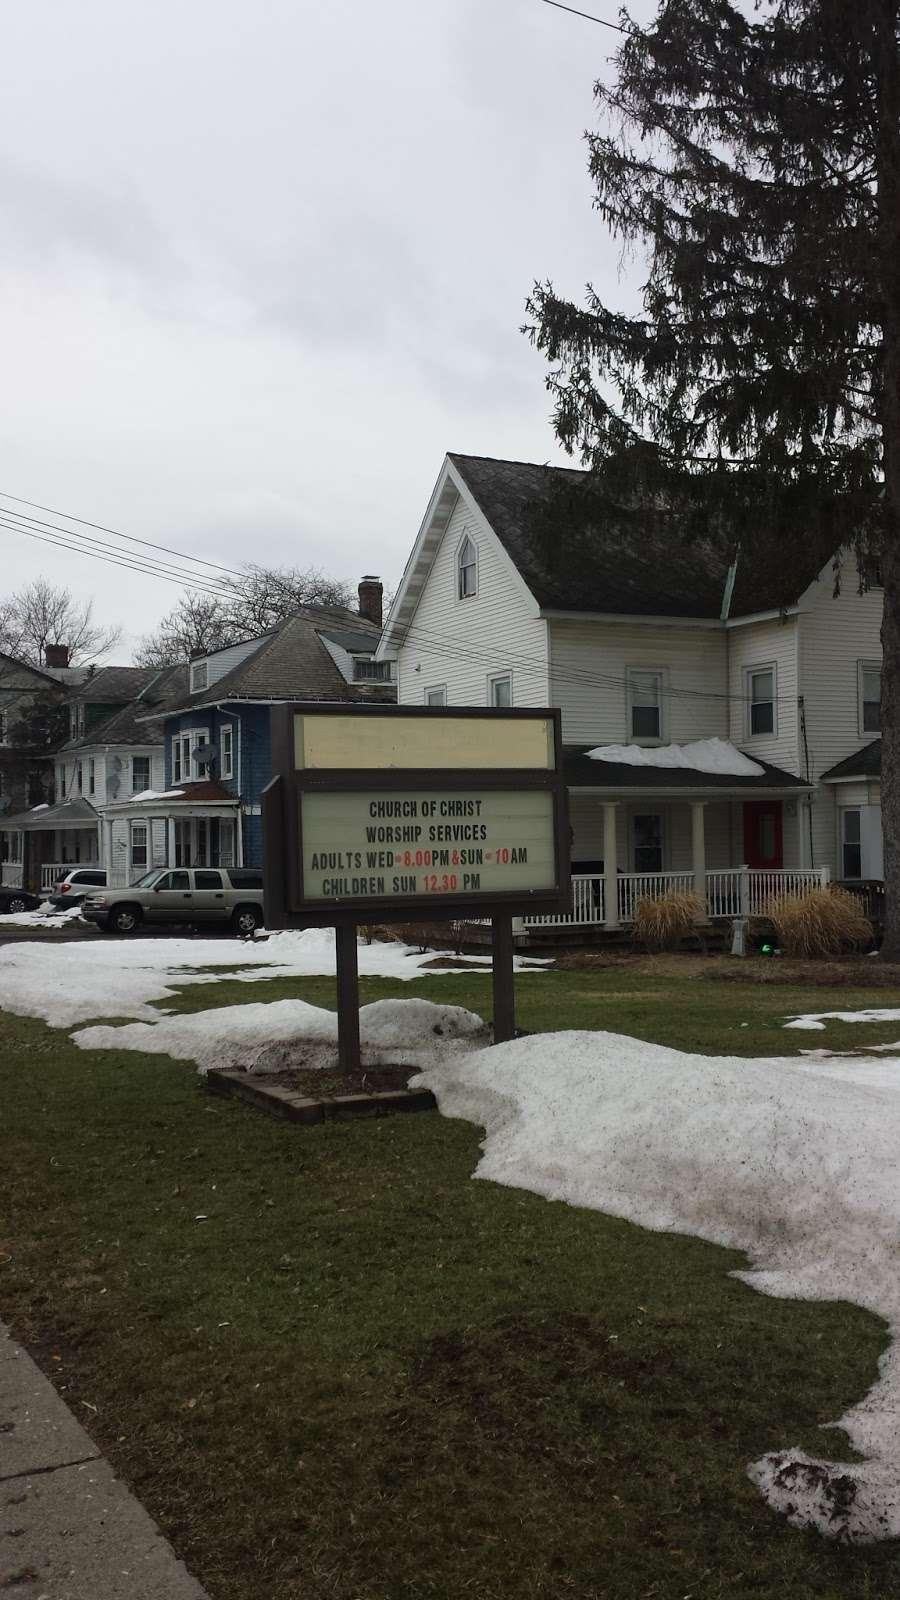 Iglesia Ni Cristo (Church Of Christ) - church  | Photo 3 of 3 | Address: 520 NY-32, Highland Mills, NY 10930, USA